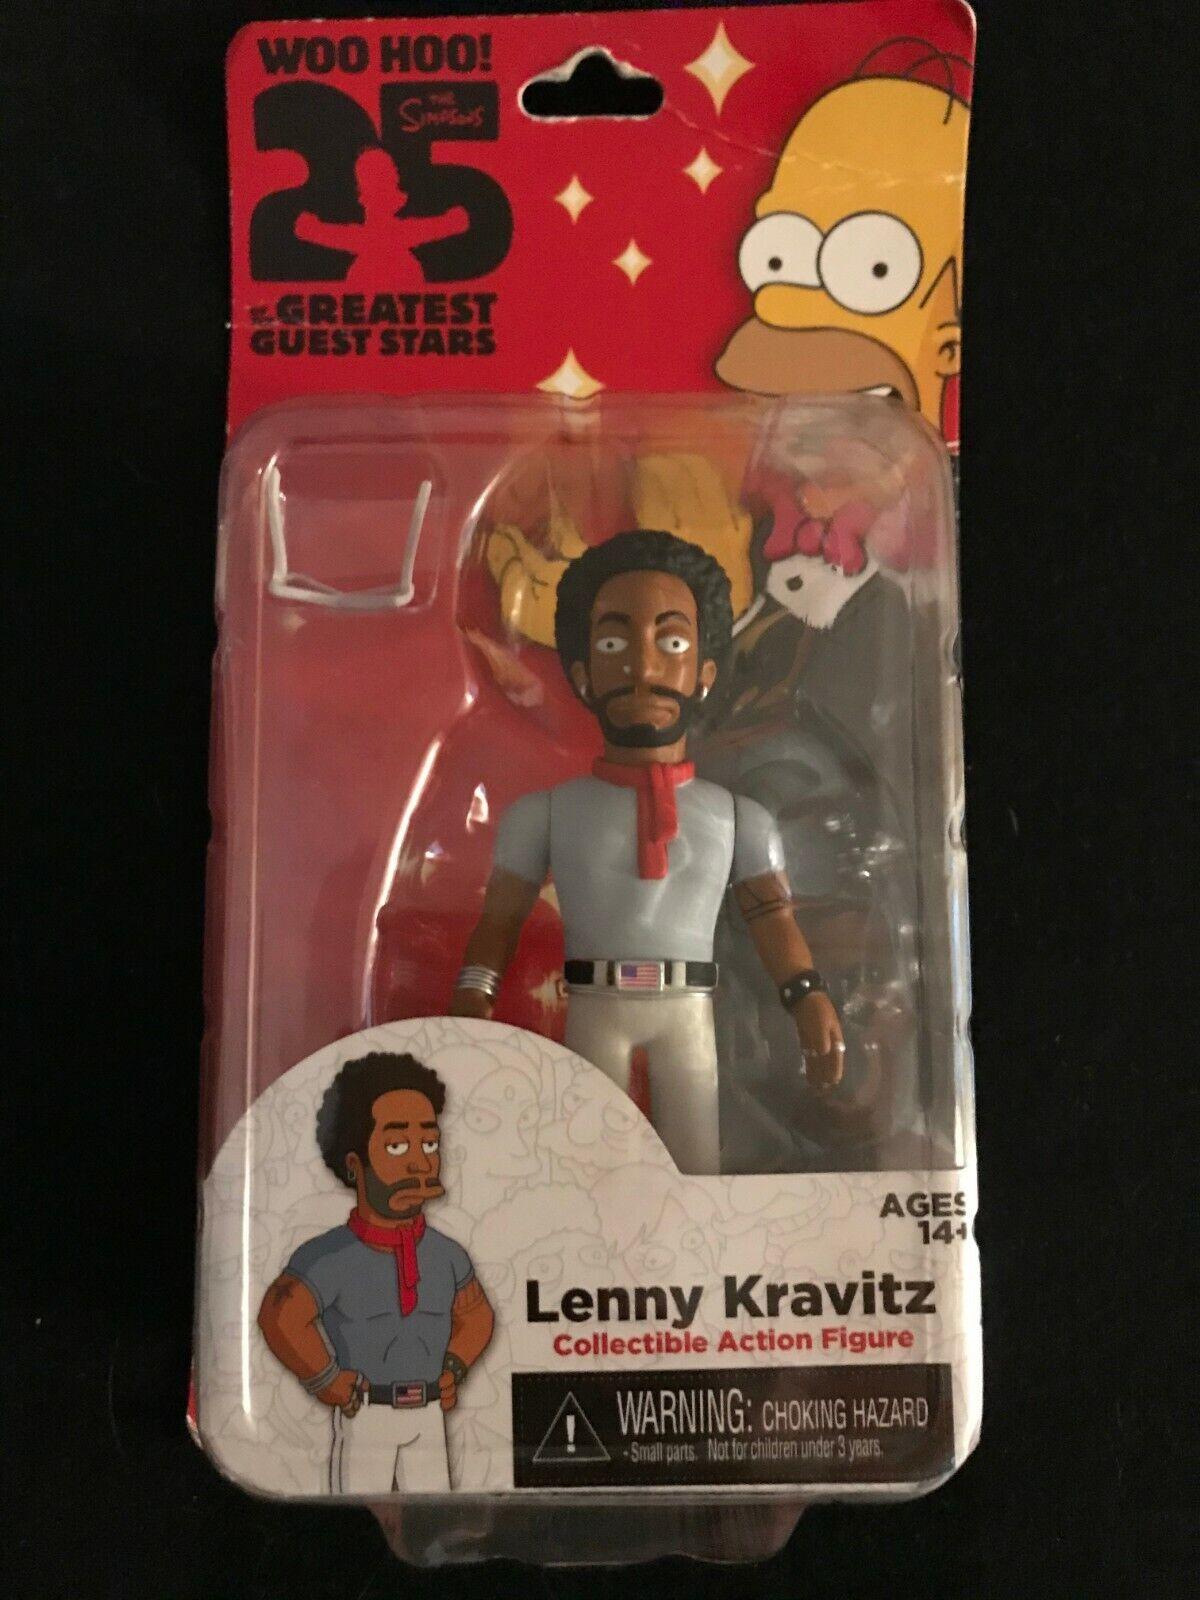 Neca The Simpsons 25th Anniversary Series 5 Lenny Kravitz 5 Action Figure - $5.99